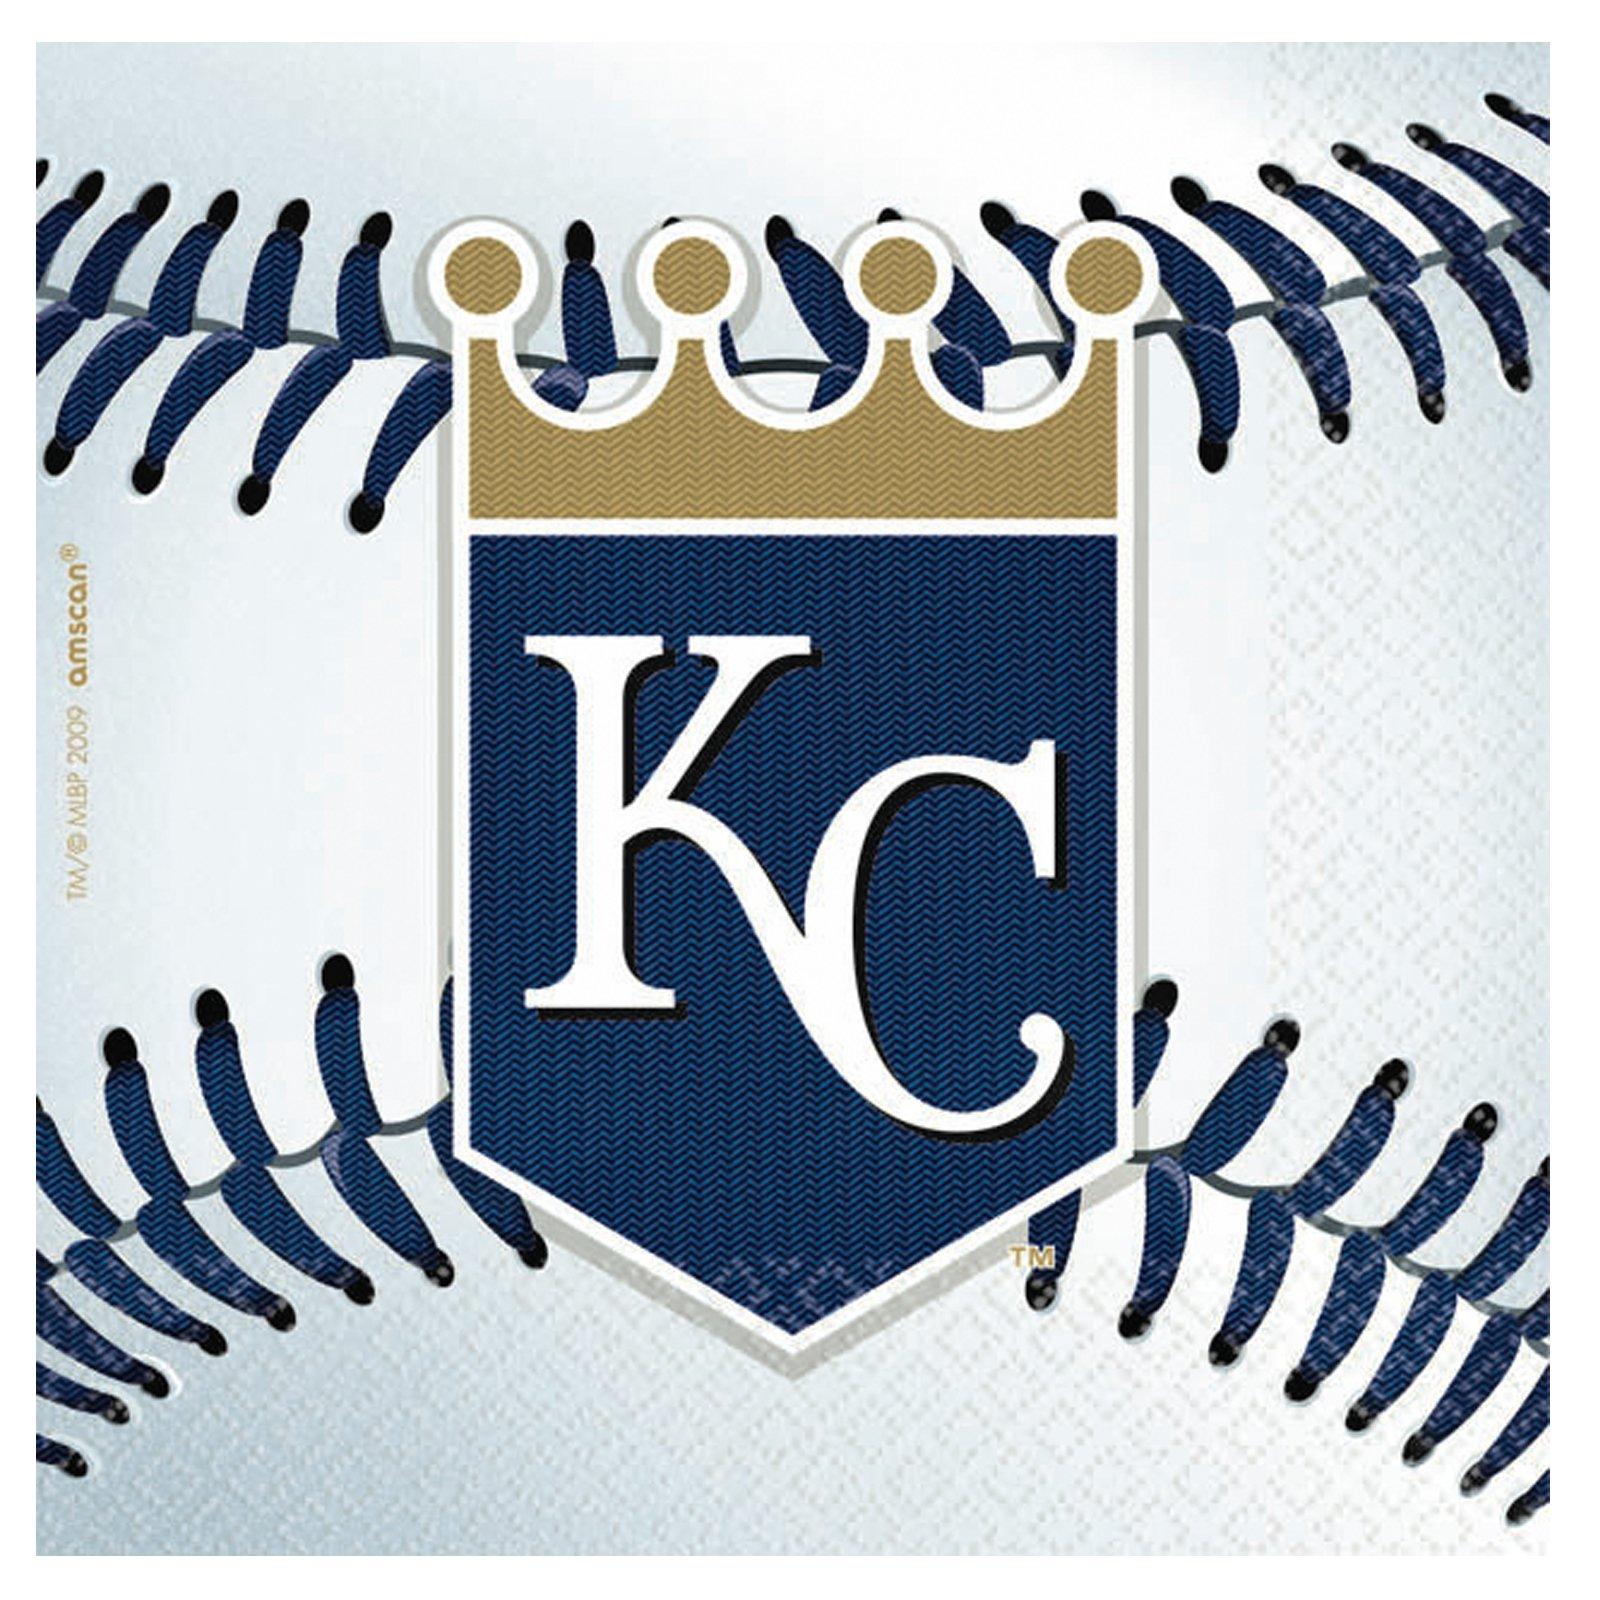 Hd Chiefs Wallpaper: KC Royals Logo Wallpaper